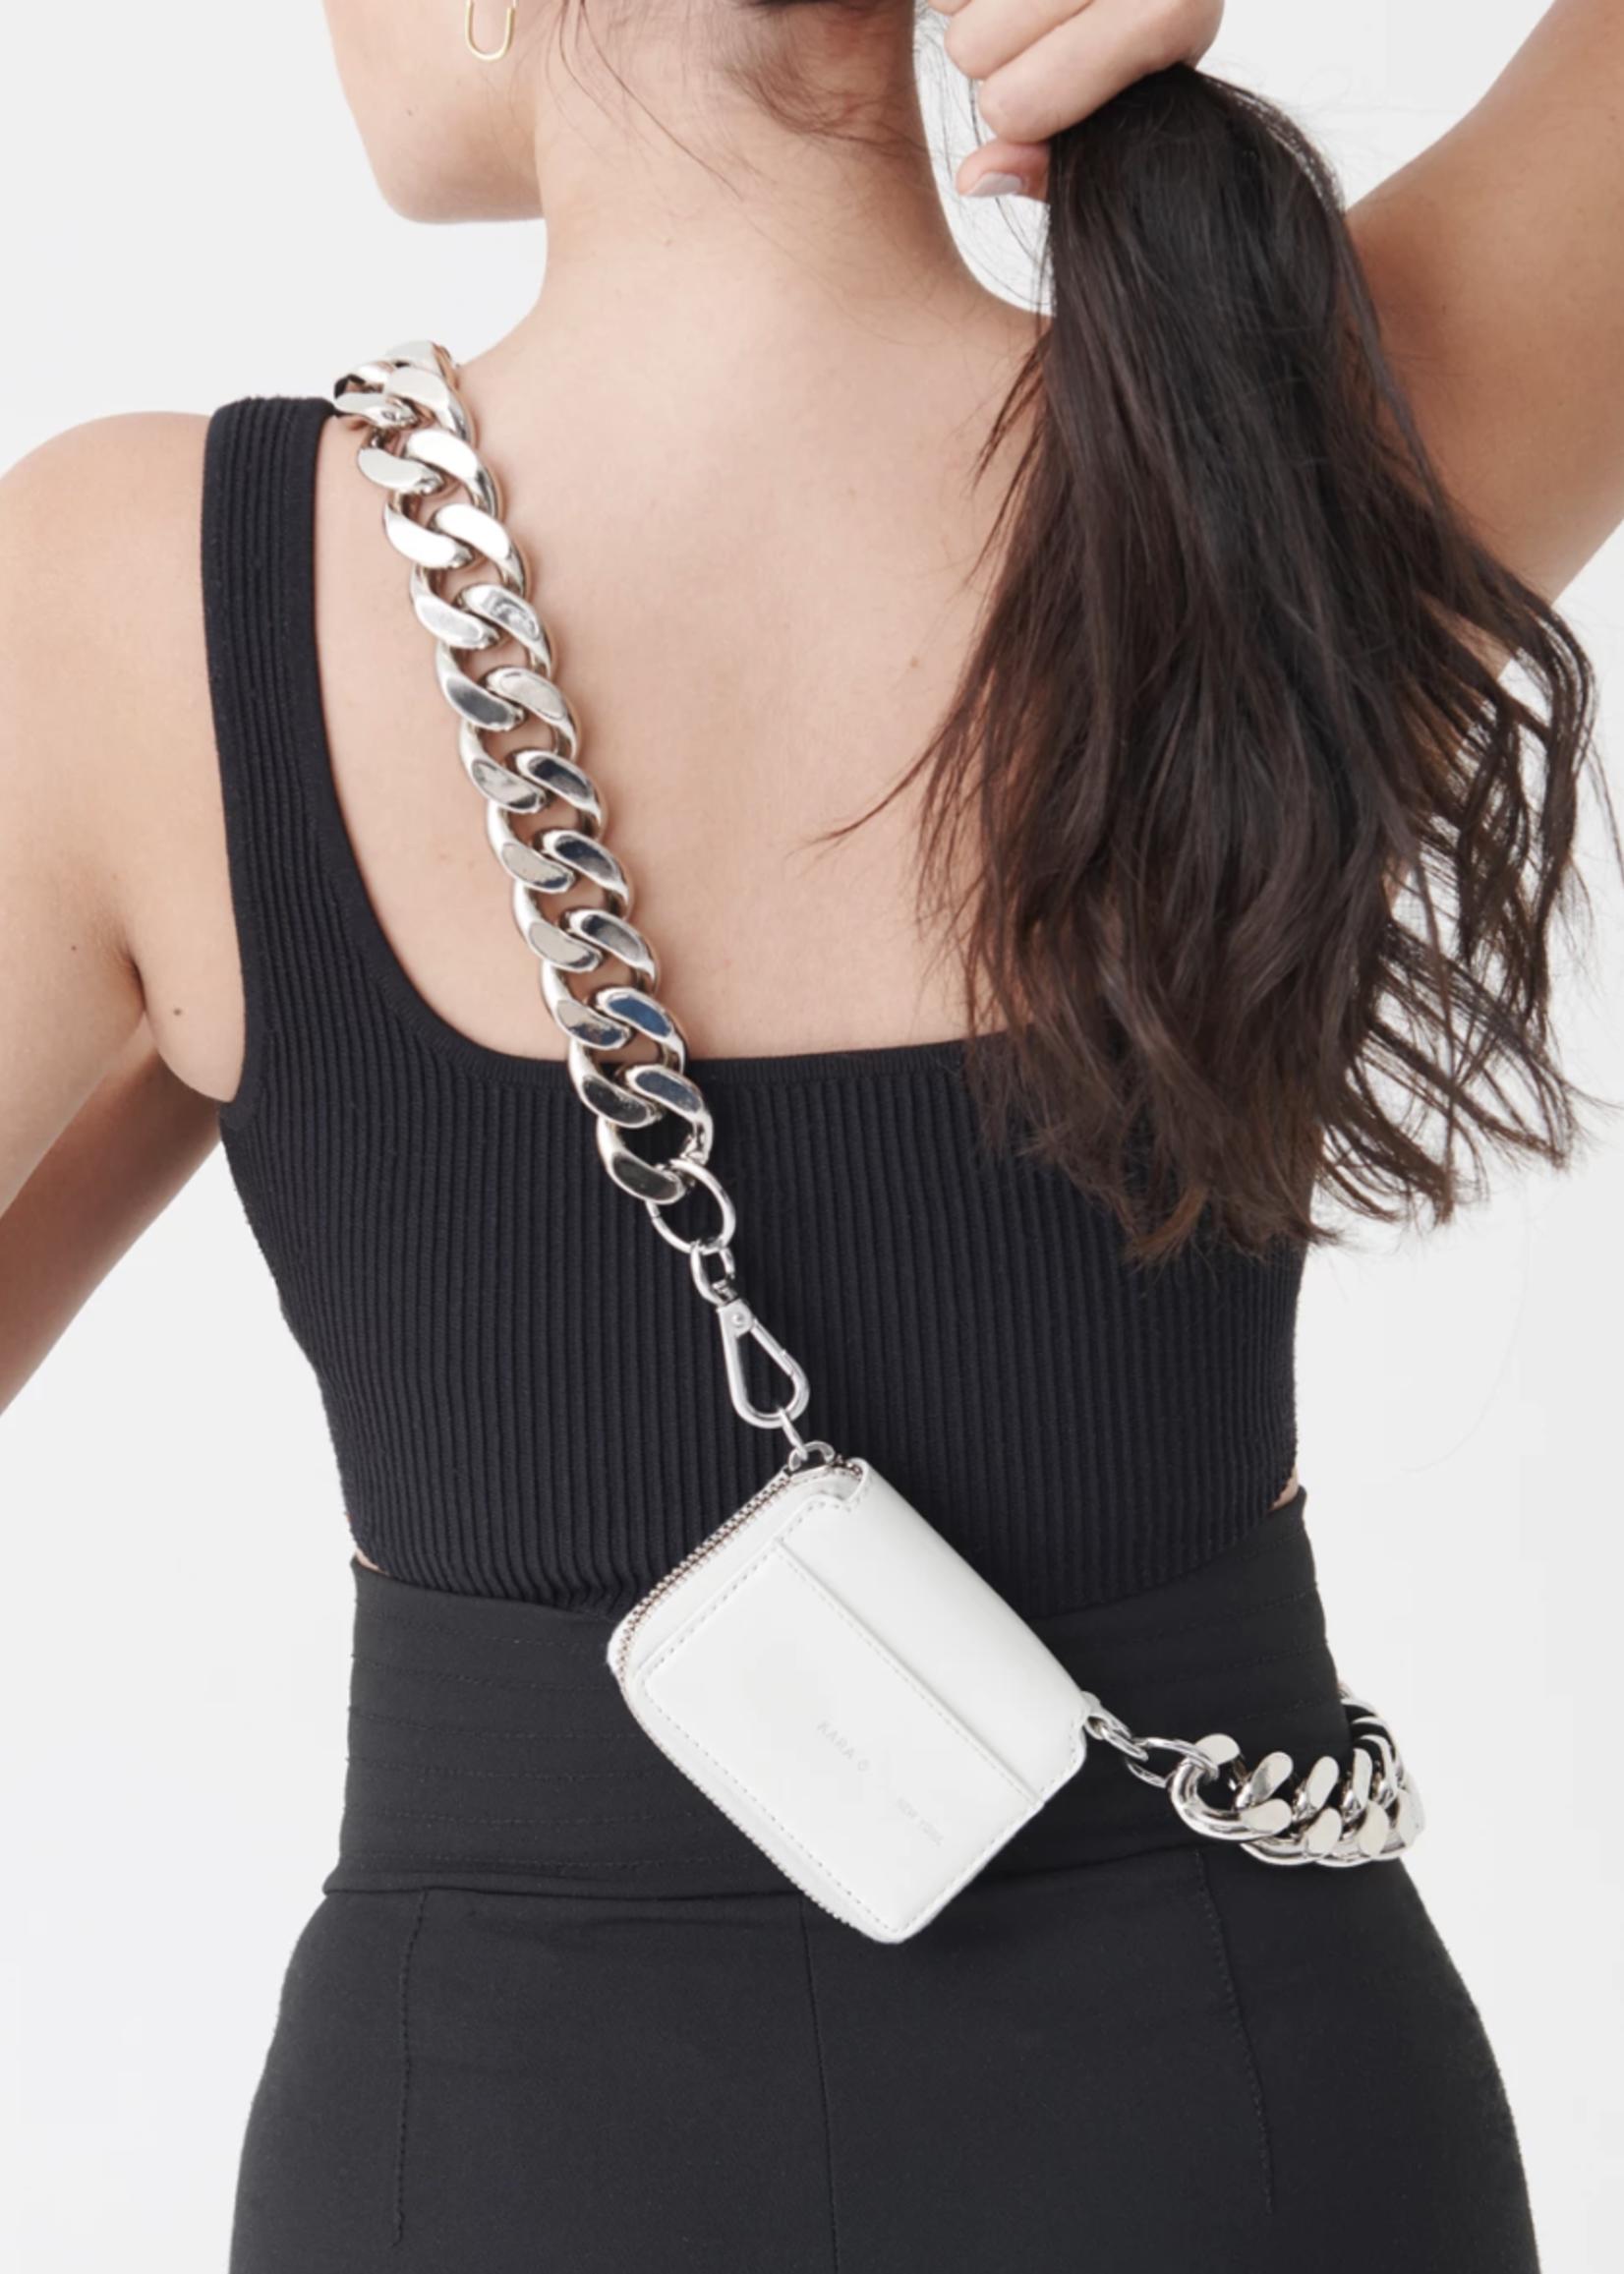 KARA KARA Bike Wallet with chain in White